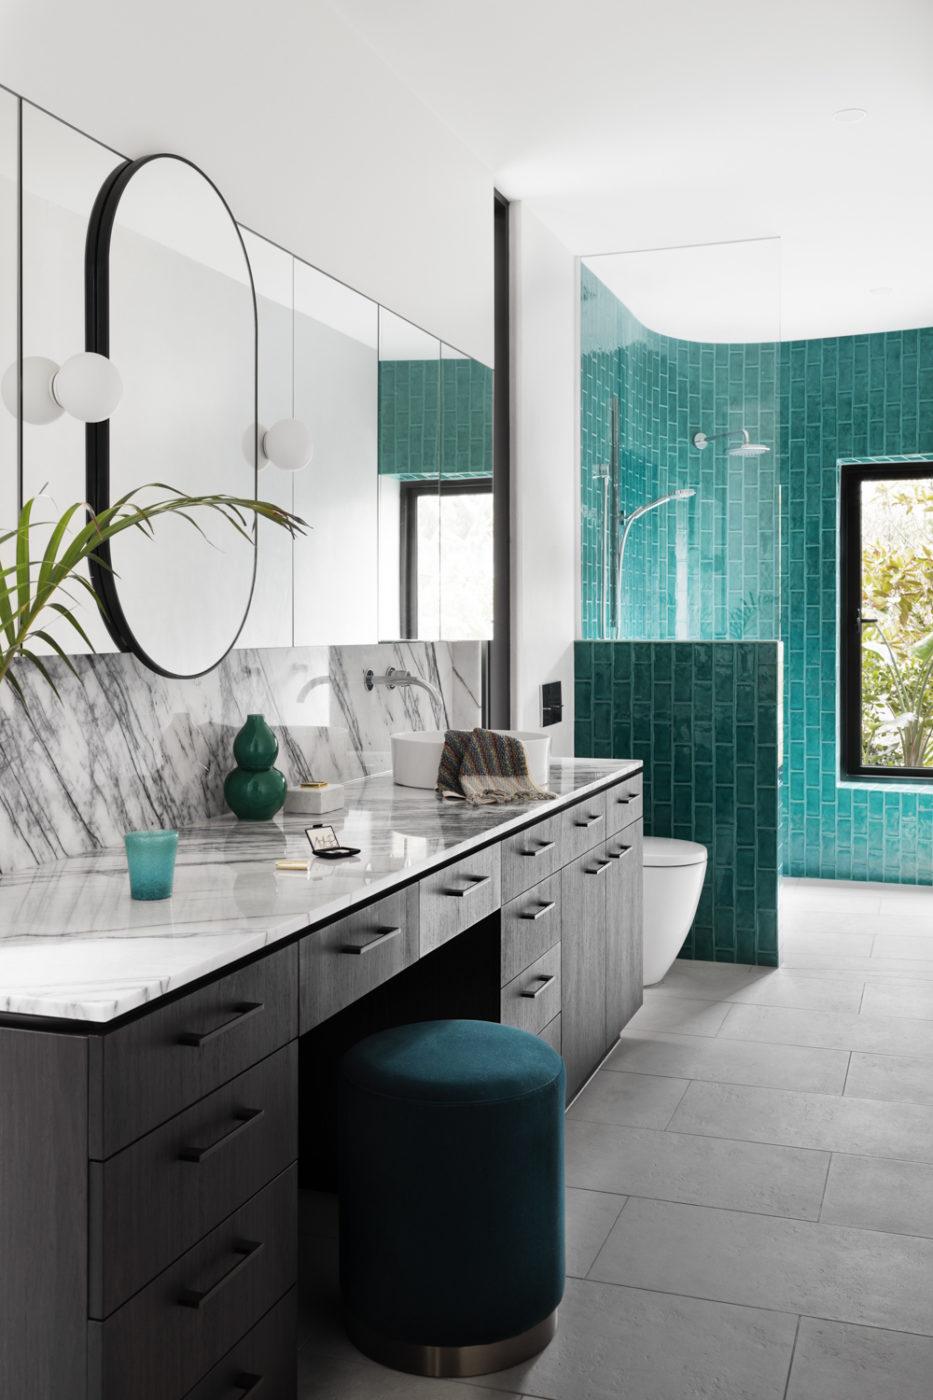 Camilla Molders Design Interior Design Decoration Melbourne